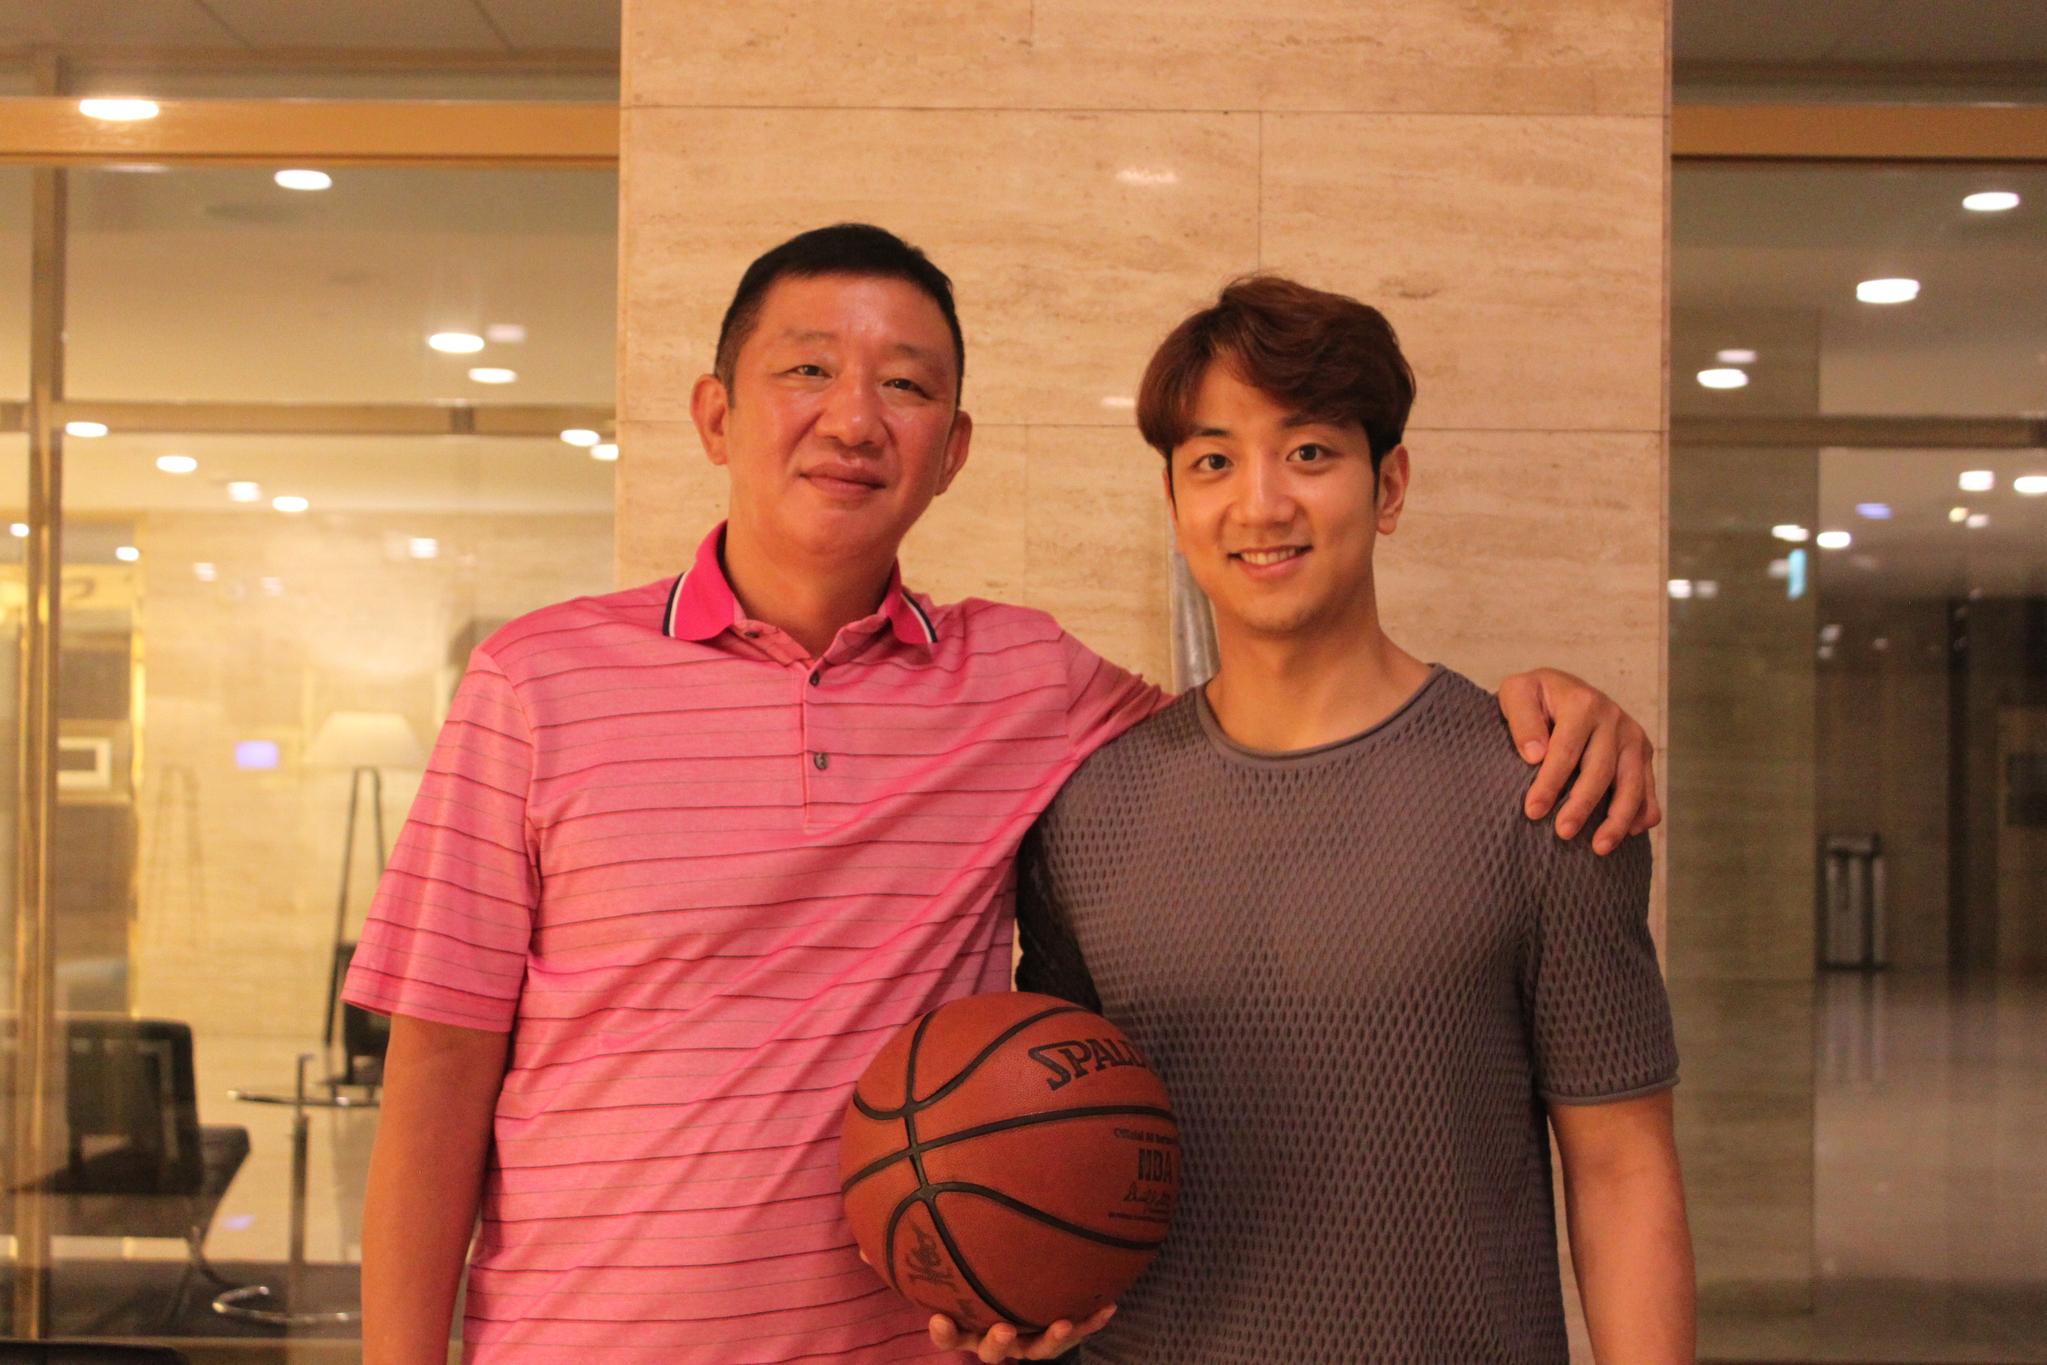 TV 예능 프로그램에서 맹활약 중인 허재(왼쪽)와 농구 월드컵에 출전한 그의 차남 허훈. 박린 기자